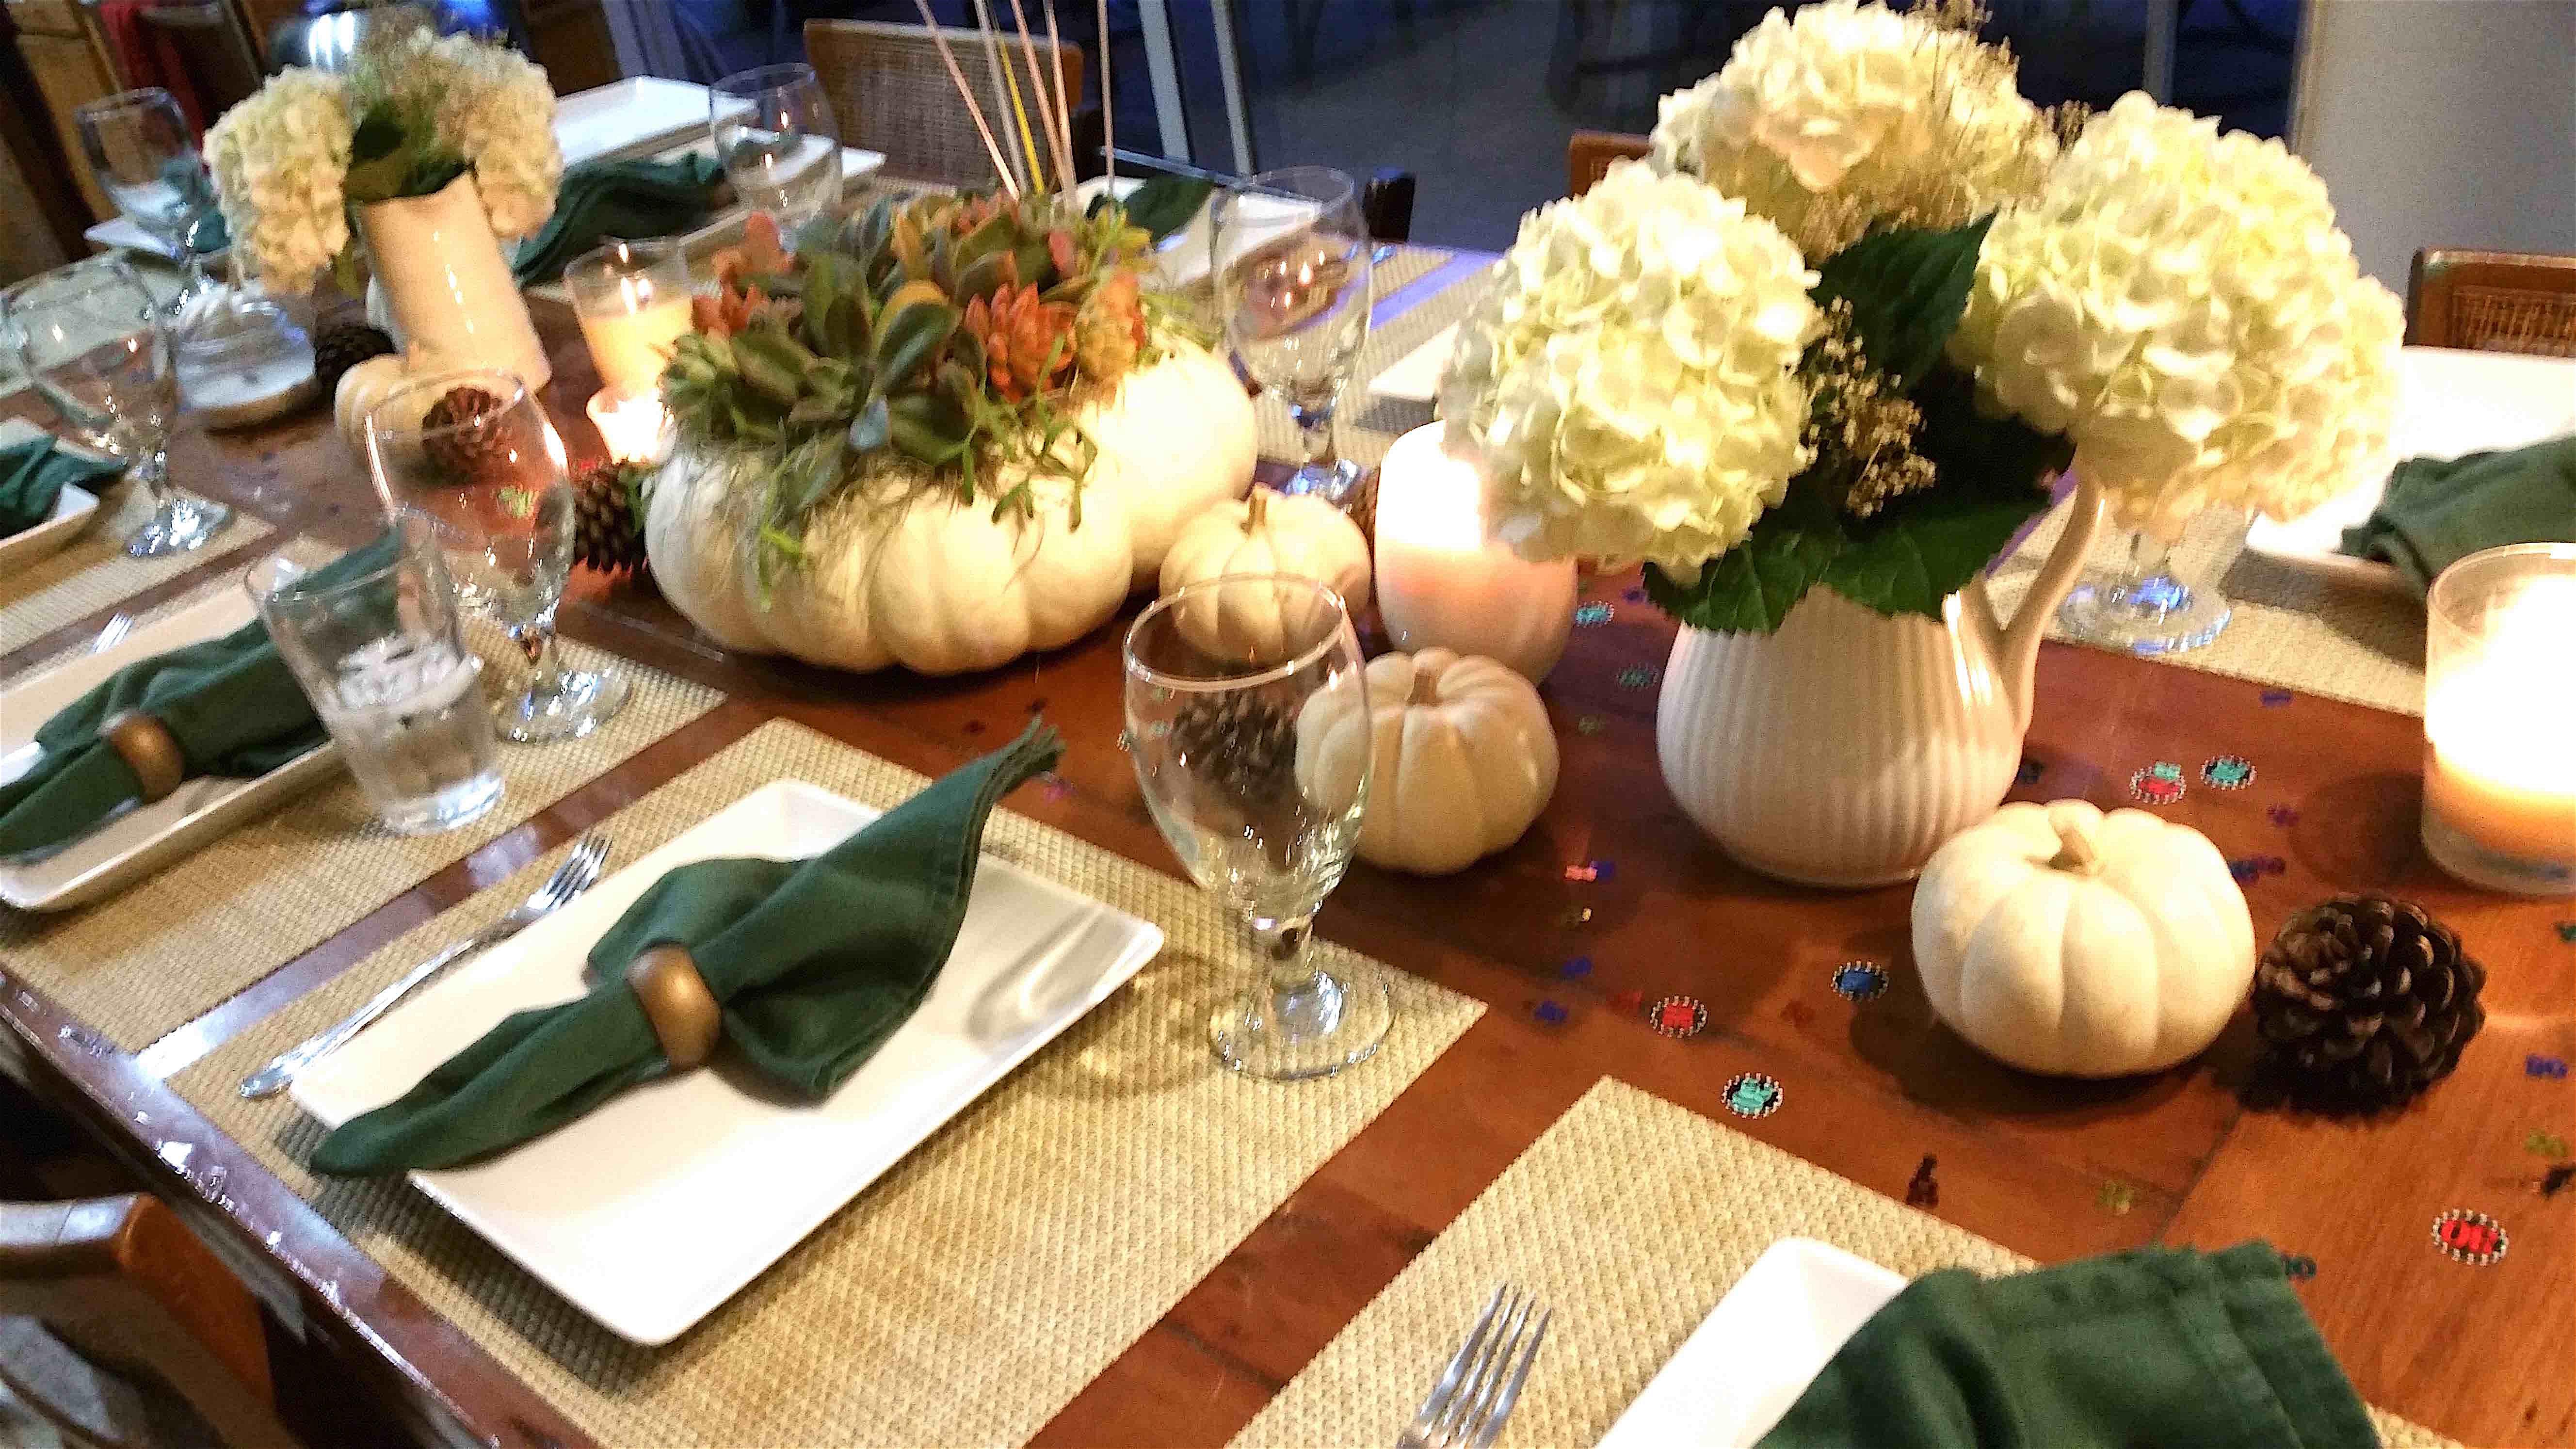 Diy How To Make Easy Succulent Covered Pumpkins Diane Uke Shares